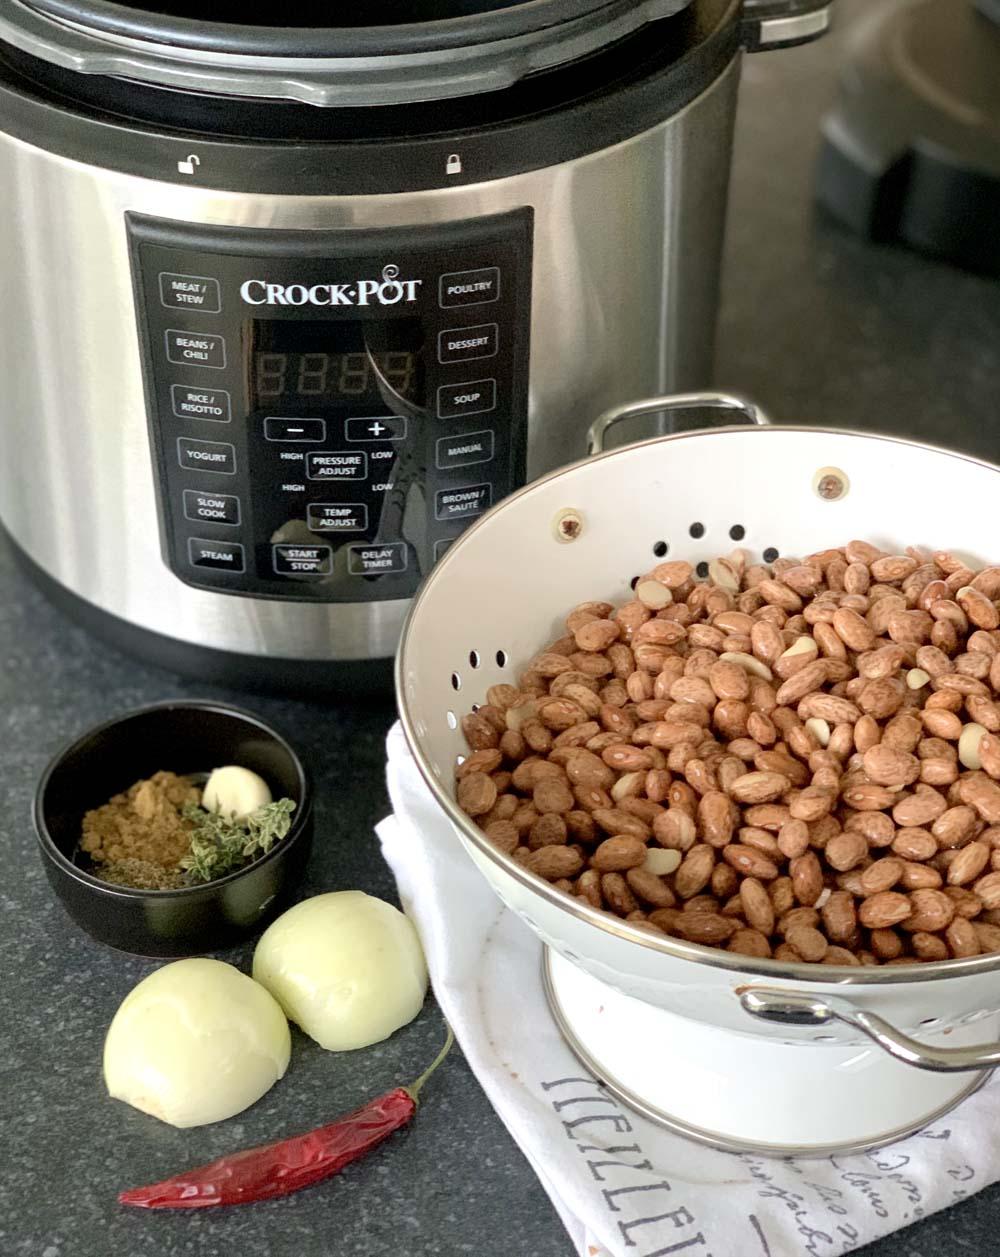 Kochen von Refried Beans im Instant Pot / Crock-Pot Express